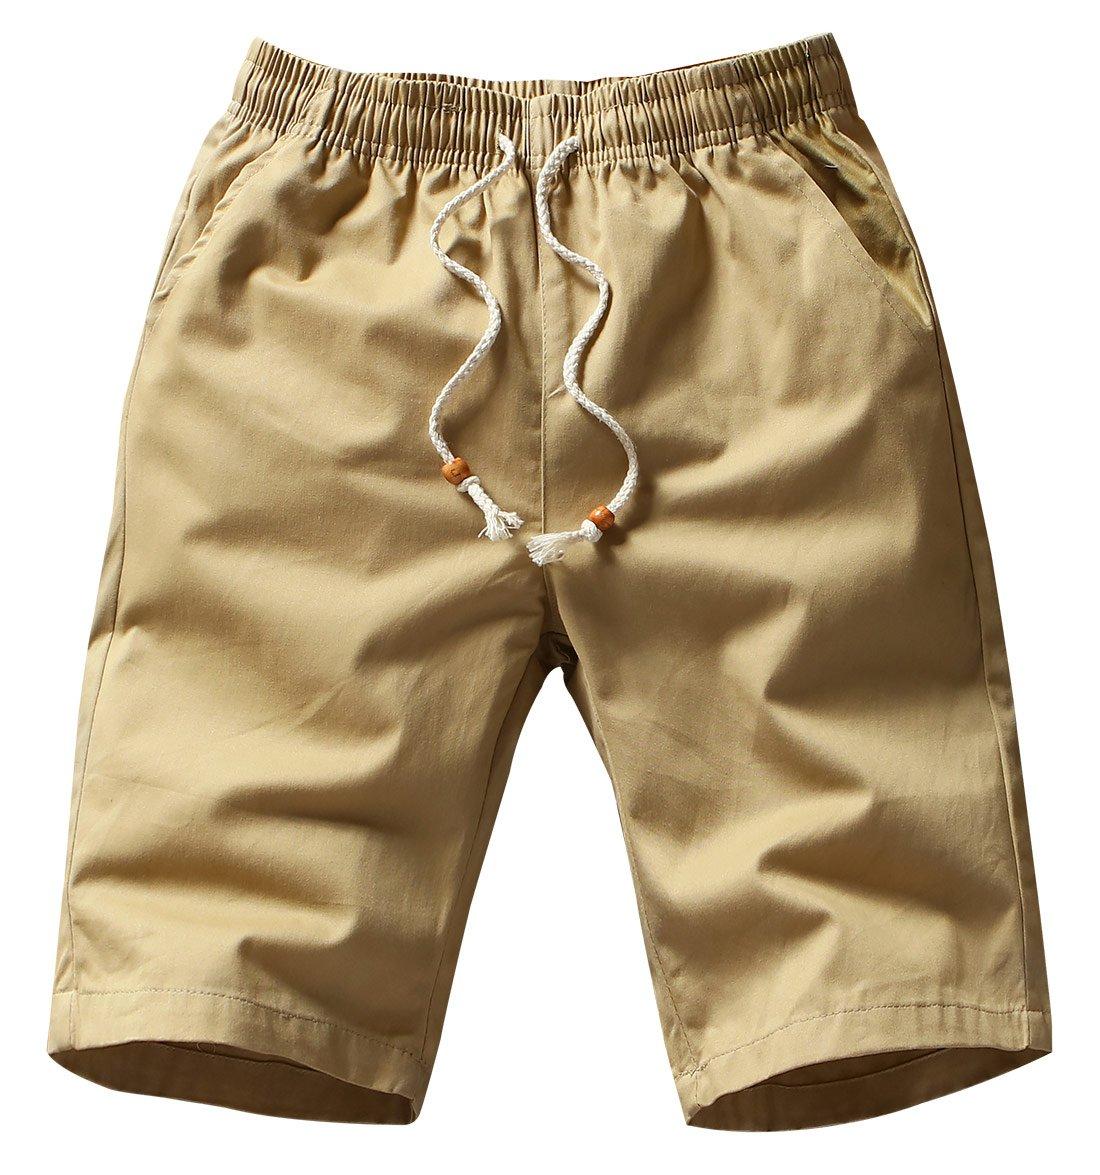 AIEOE Men's Summer Short Pants Cotton Twill Cargo Shorts Beach Pants Outdoor Wear Elastic Waist Short Trousers Size XL- Khaki